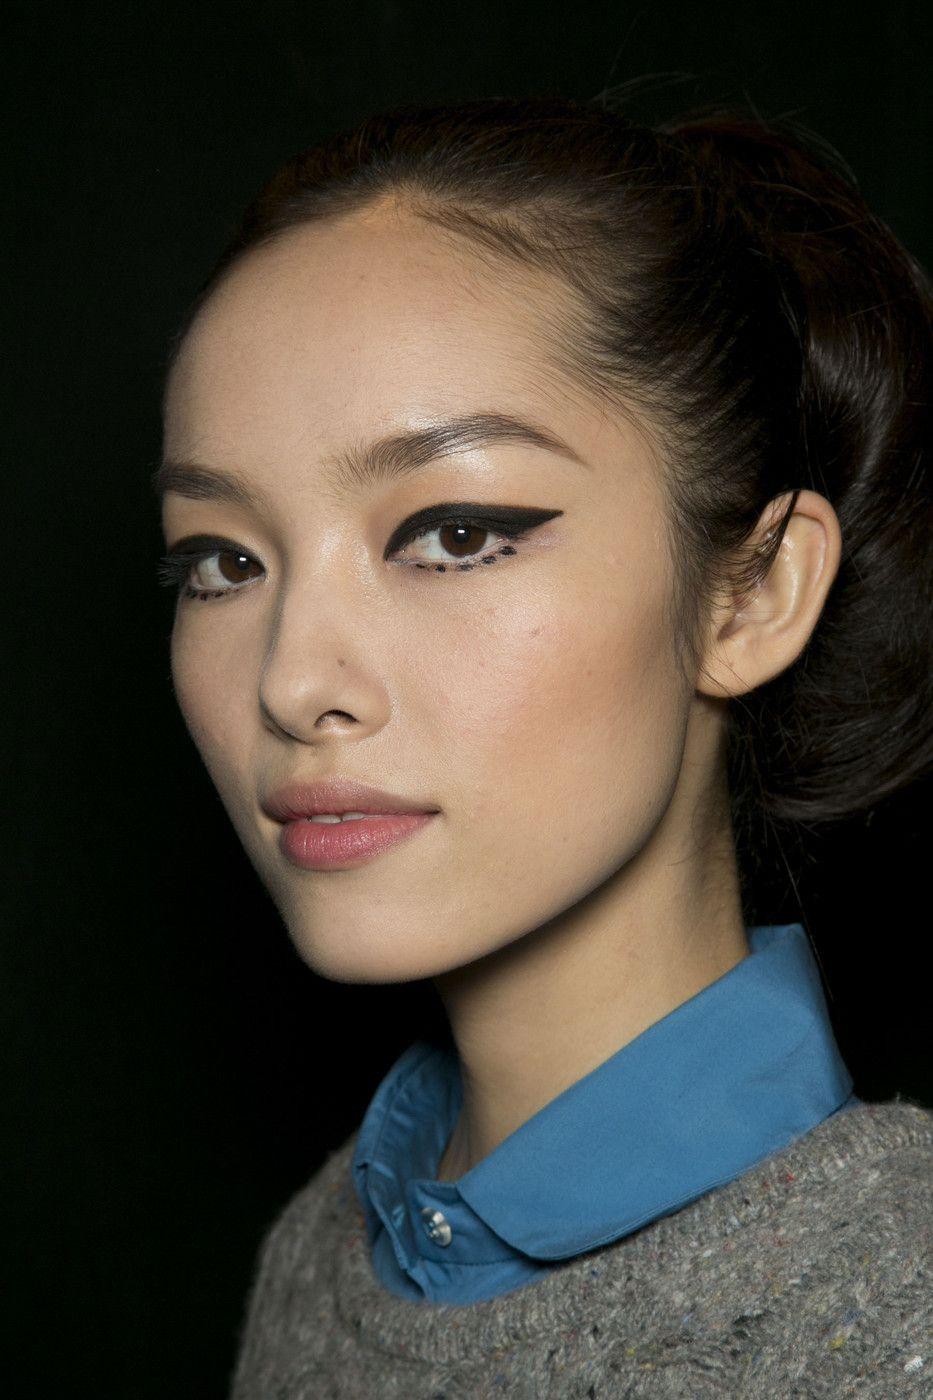 graphic winged eyeliner, collared blue shirt & grey